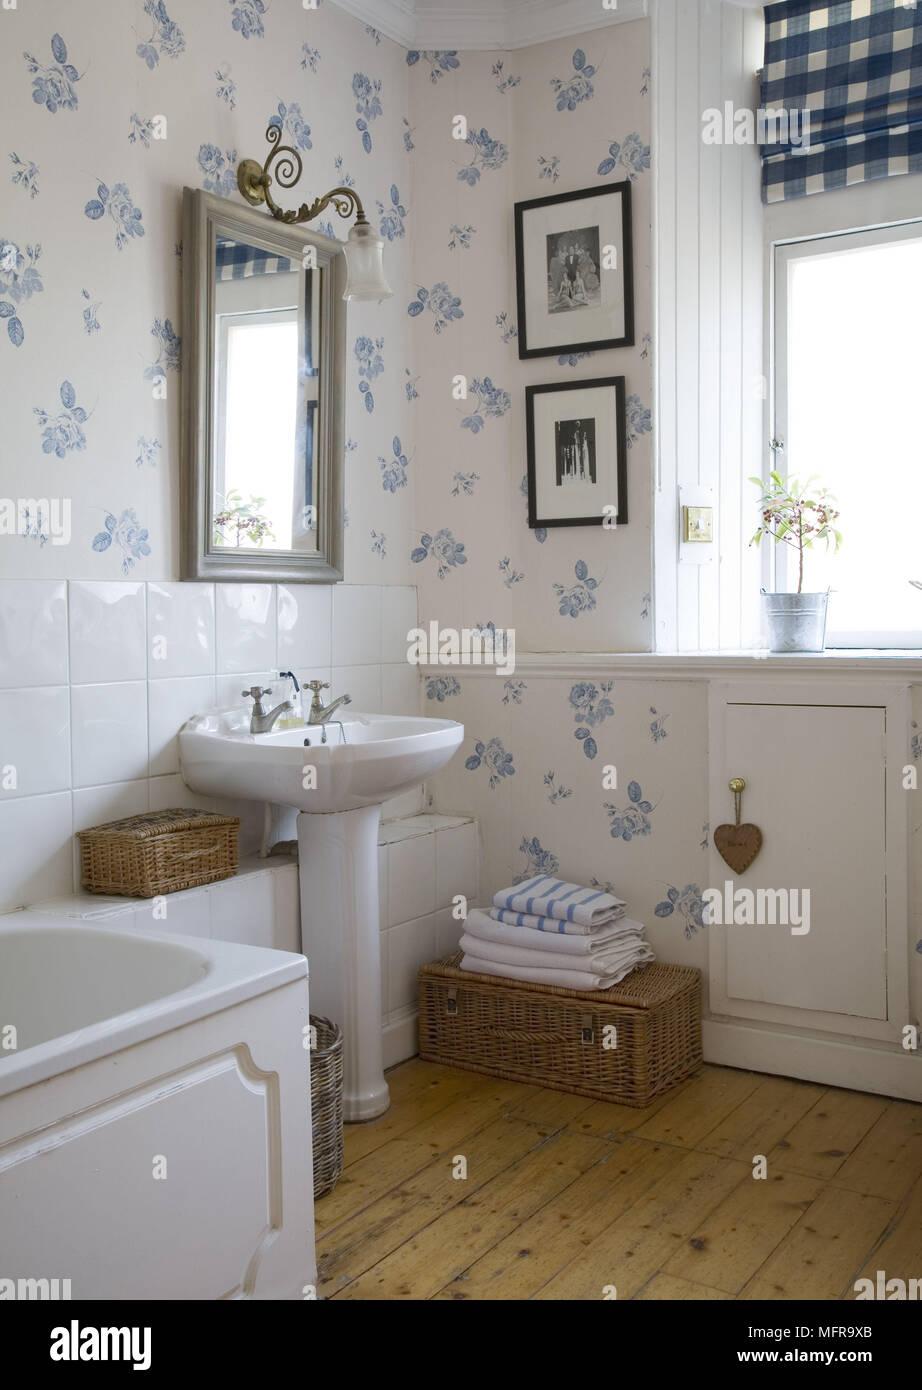 Muster badezimmer interesting badezimmer badezimmer exklusiv attraktive bad fliesen exklusiv - Badezimmer muster ...